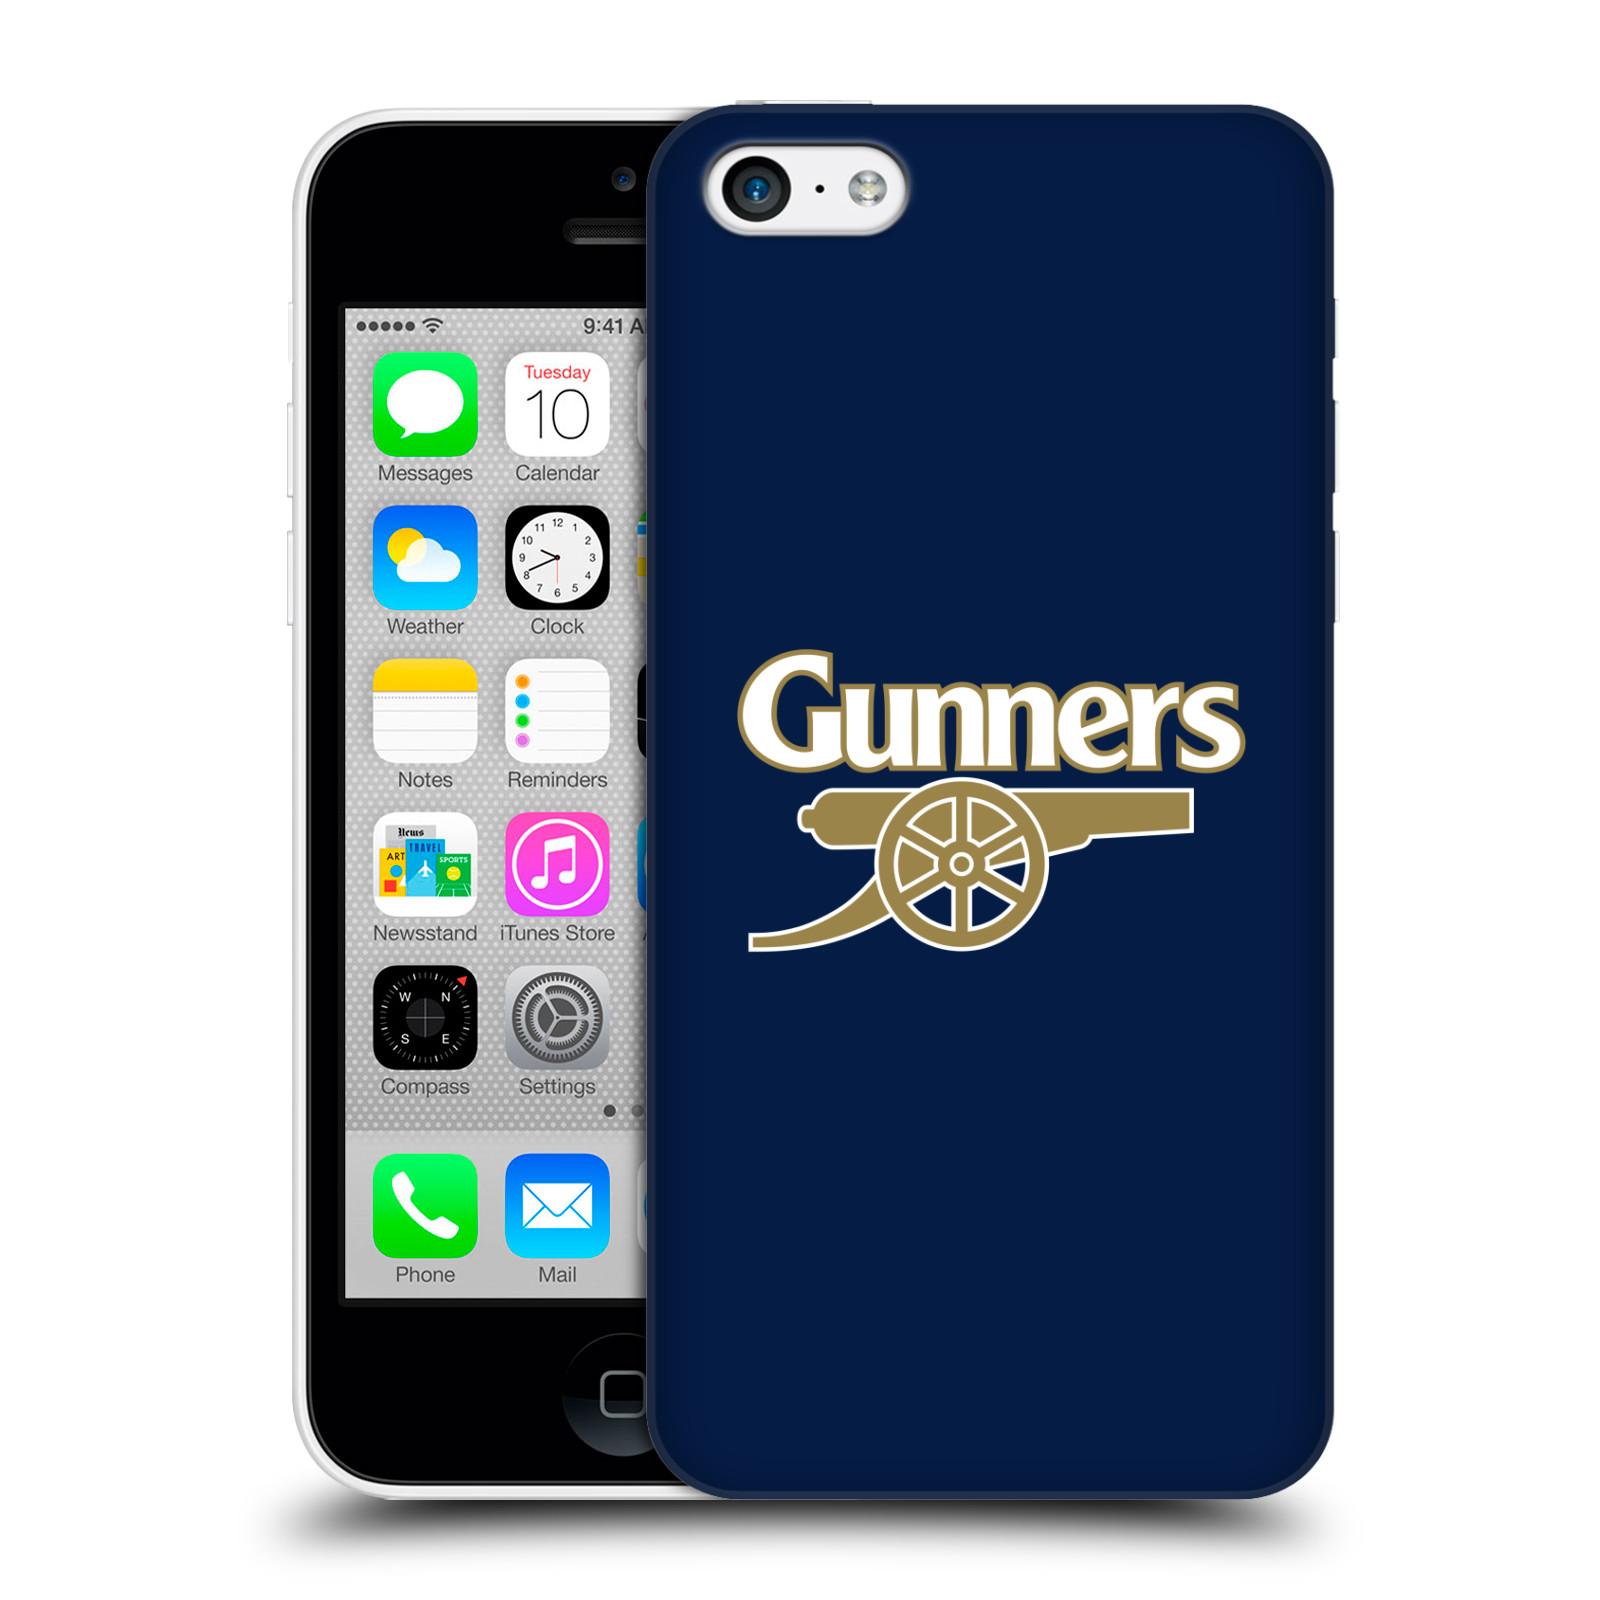 Plastové pouzdro na mobil Apple iPhone 5C - Head Case - Arsenal FC - Gunners